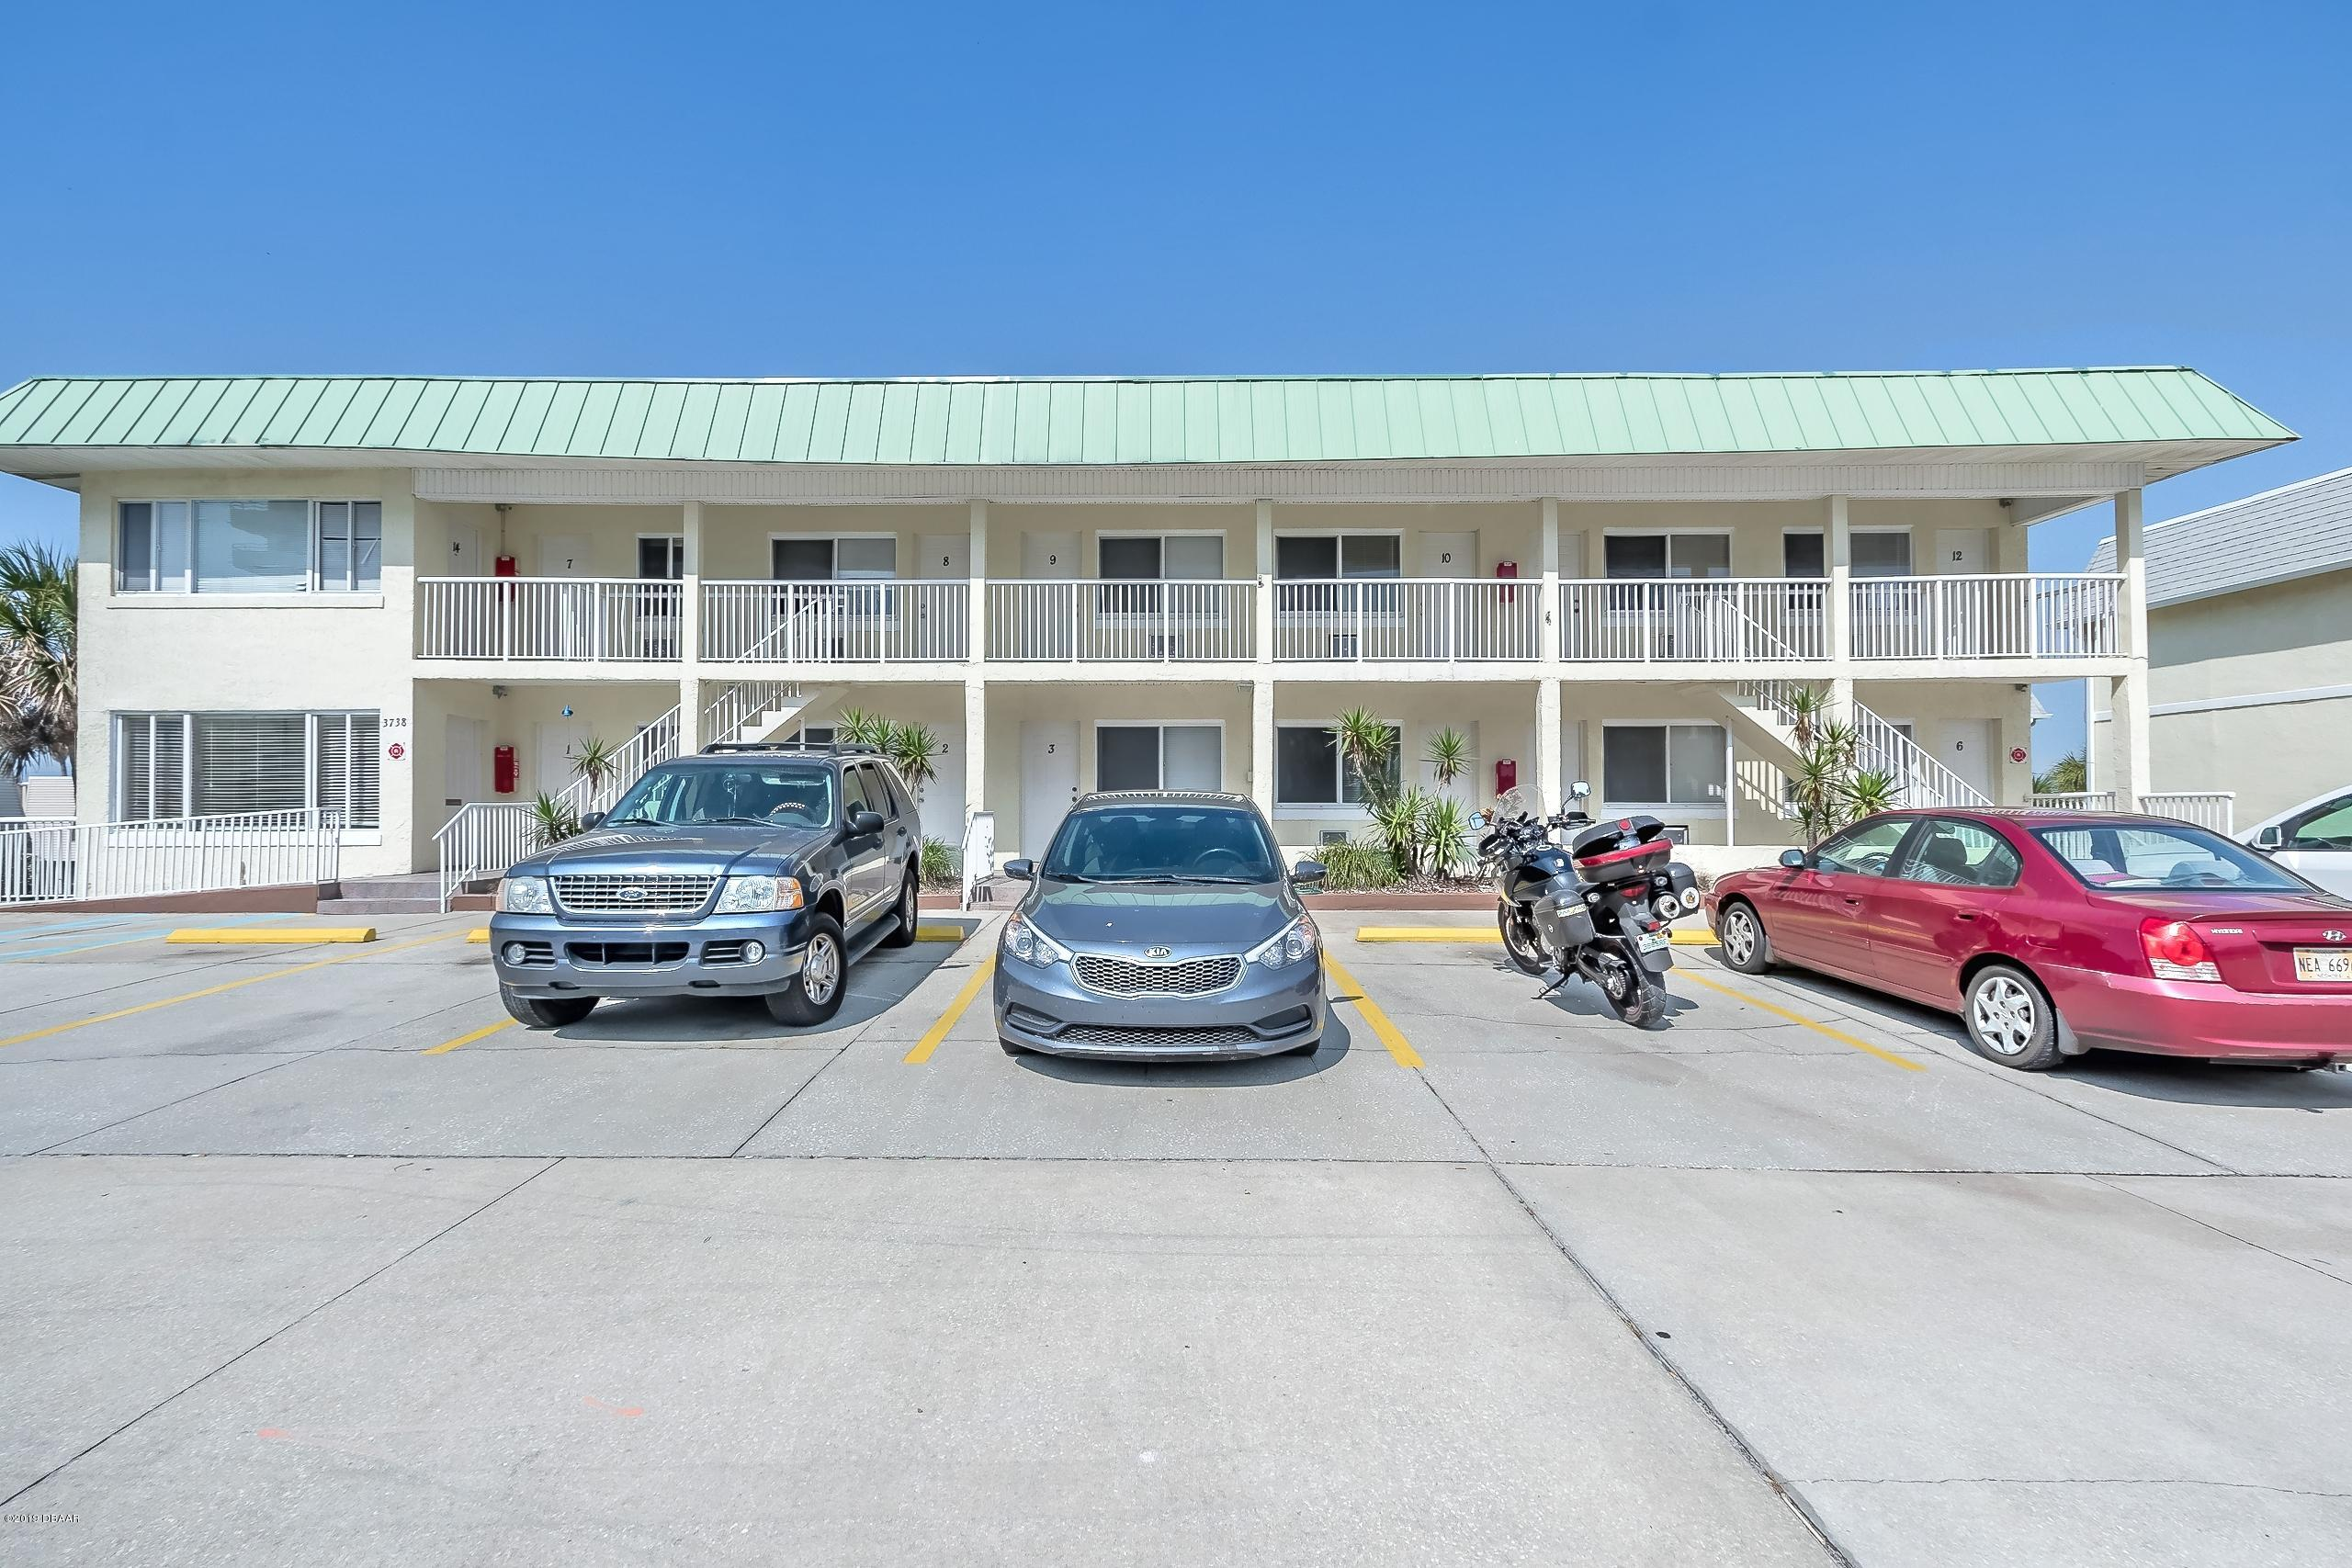 Photo of 3738 S Atlantic Avenue, Daytona Beach Shores, FL 32118